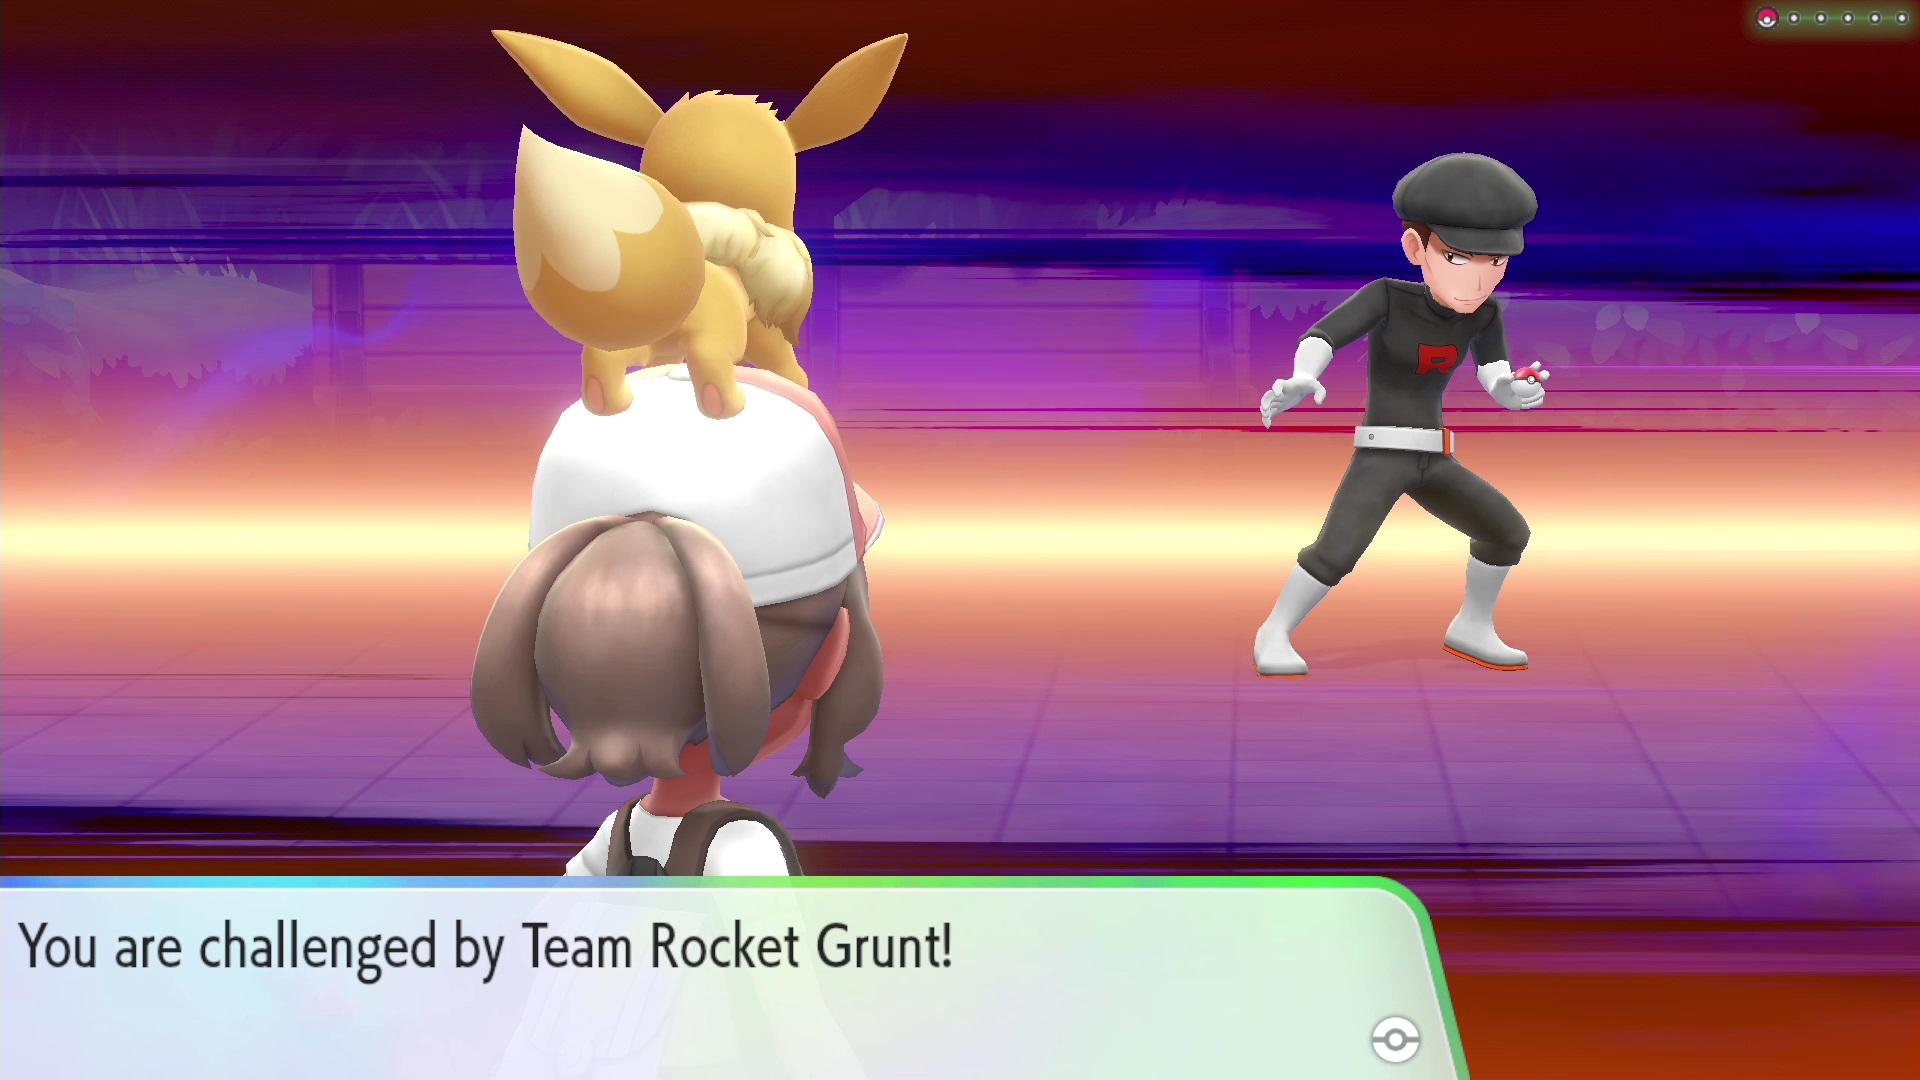 Pokemon Lets Go Pikachu  Eevee details and screenshots